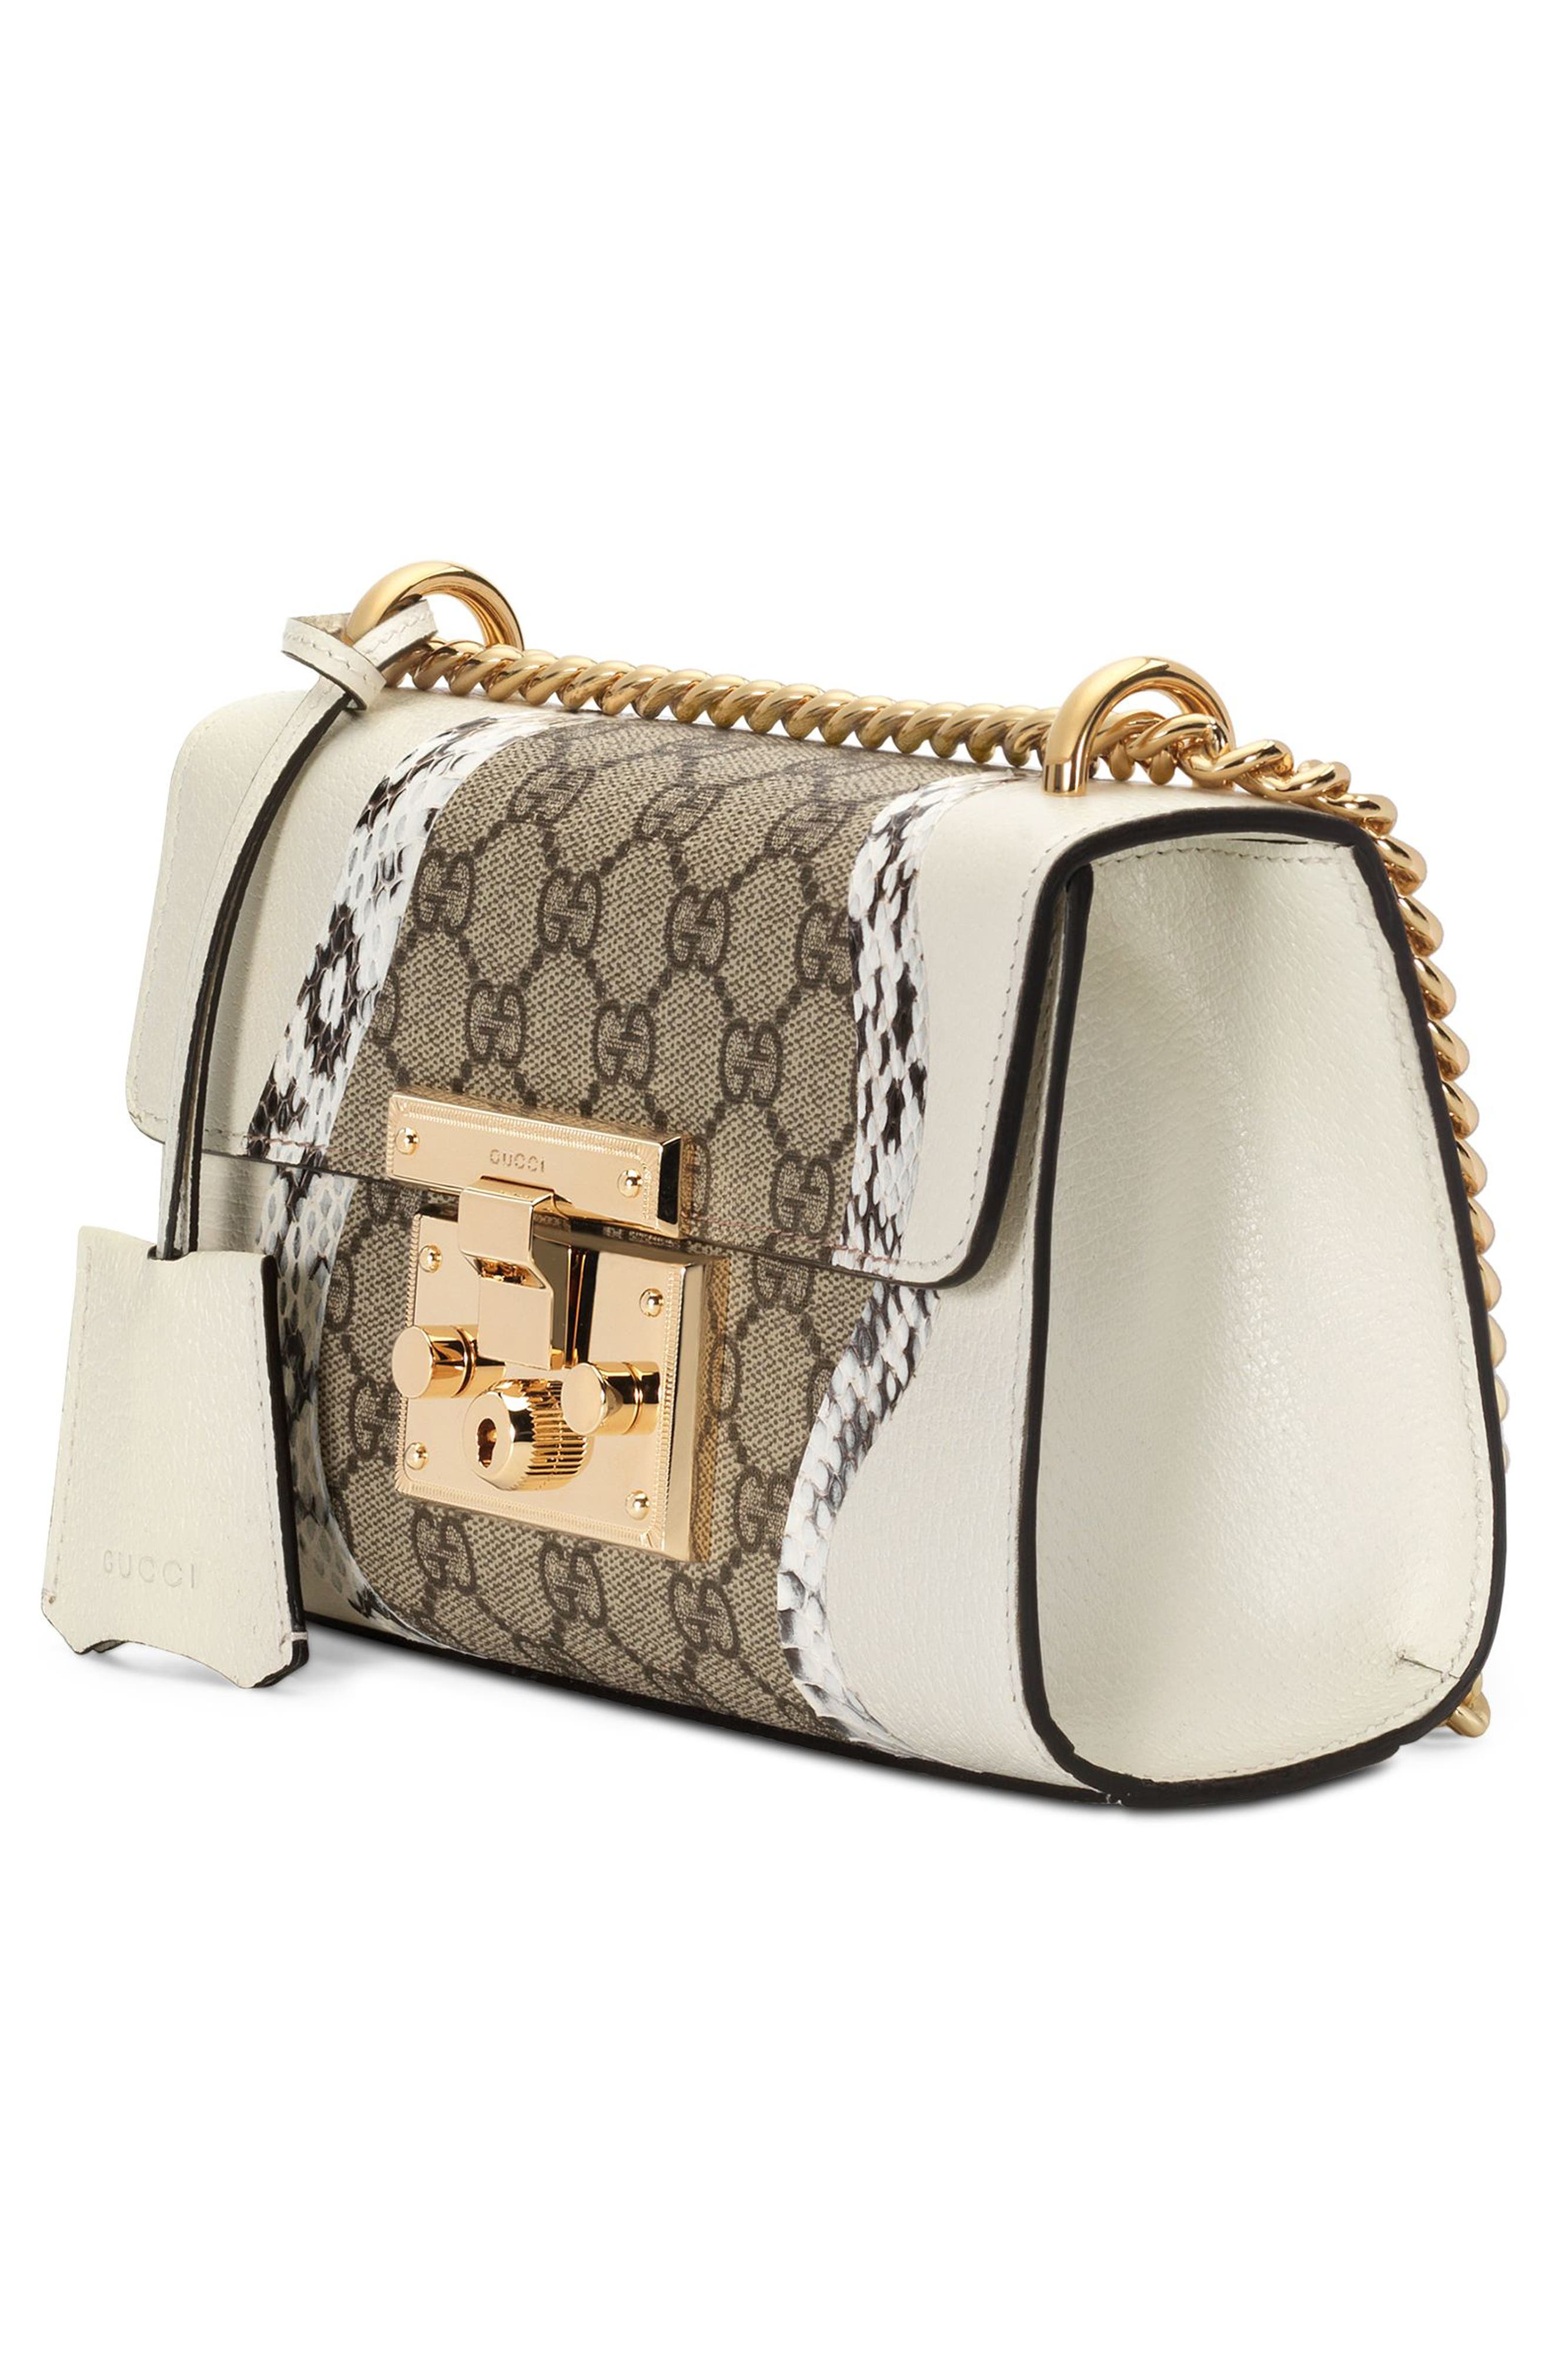 Small Padlock GG Supreme Wave Shoulder Bag with Genuine Snakeskin Trim,                             Alternate thumbnail 4, color,                             White/ Roccia/ Beige Ebony